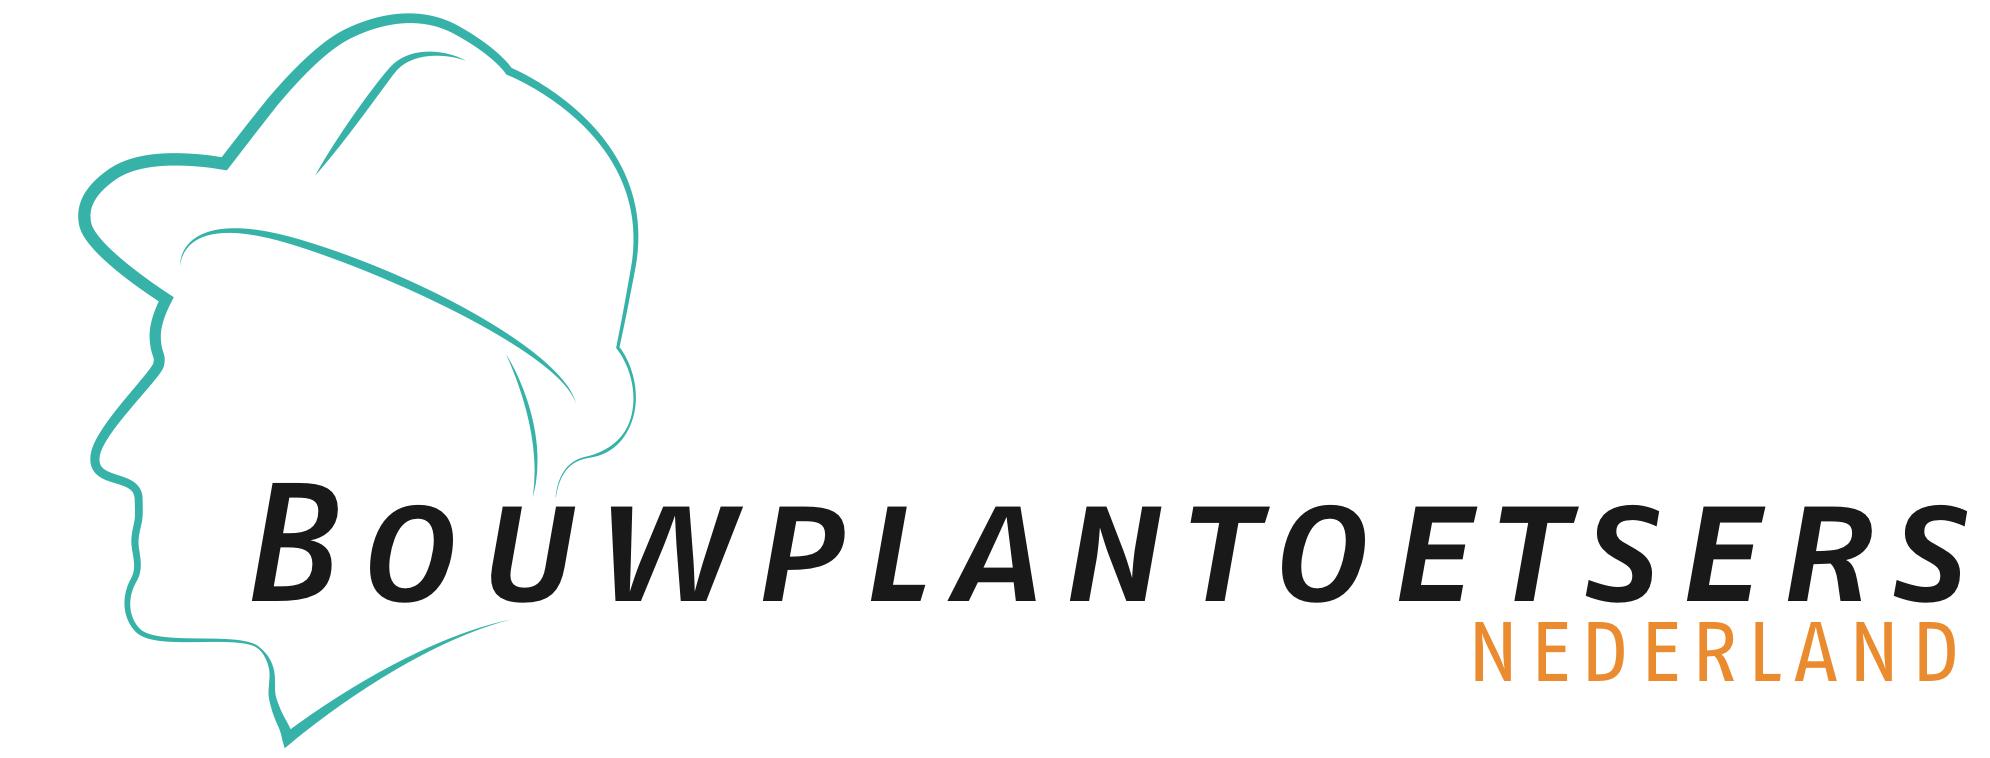 Logo-Bouwplantoetsers Nederland.jpg